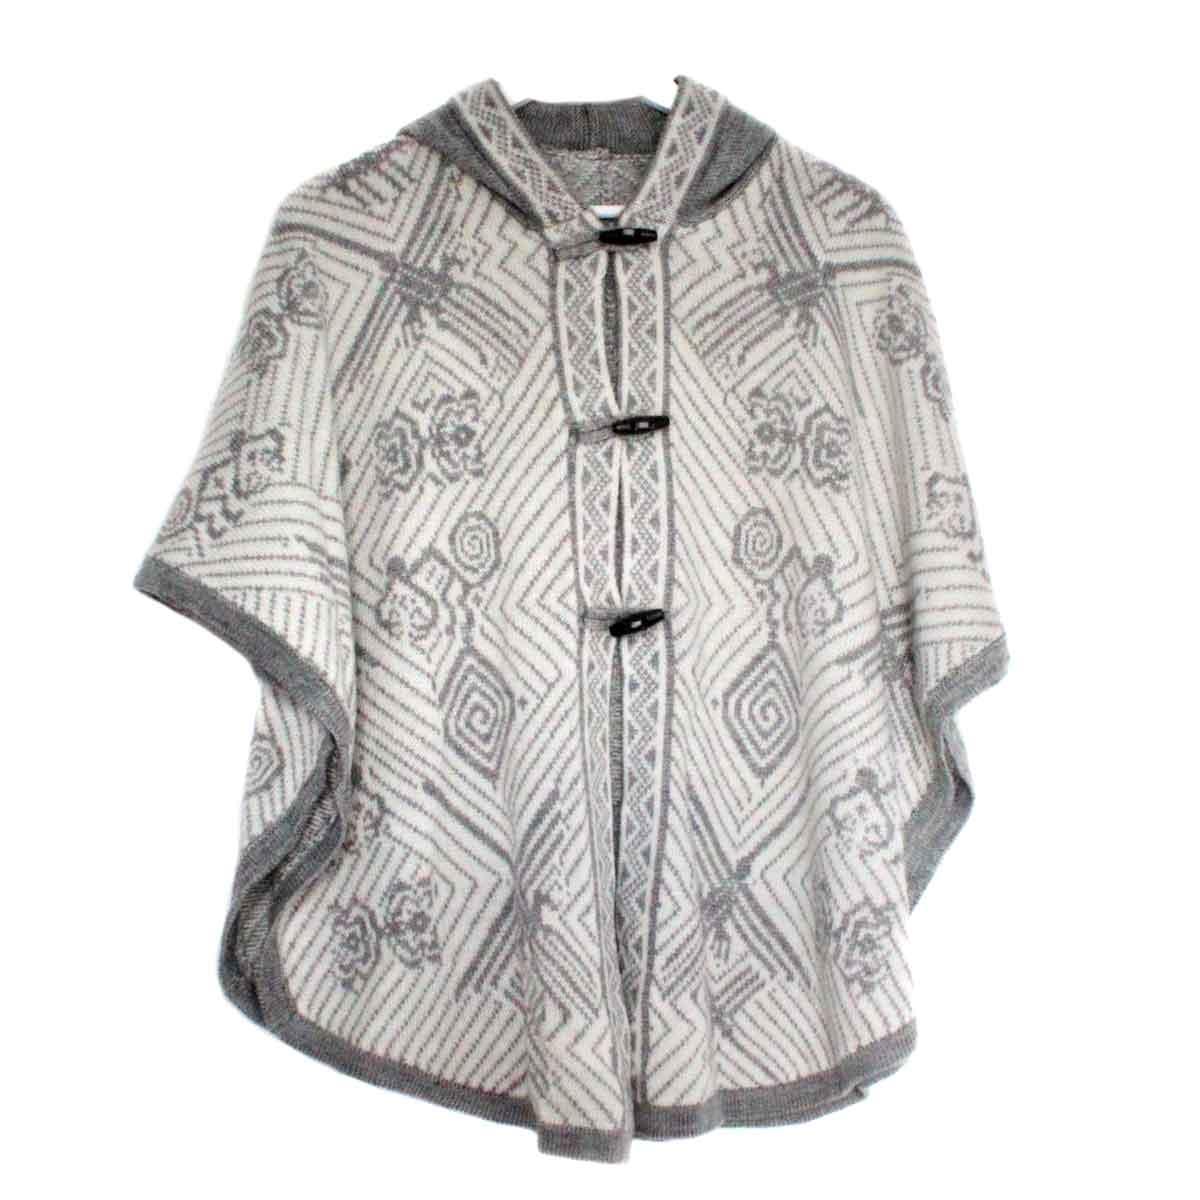 Inka-Products-Cape Alpaga HAPPINA-Blanc Motifs Ethniques